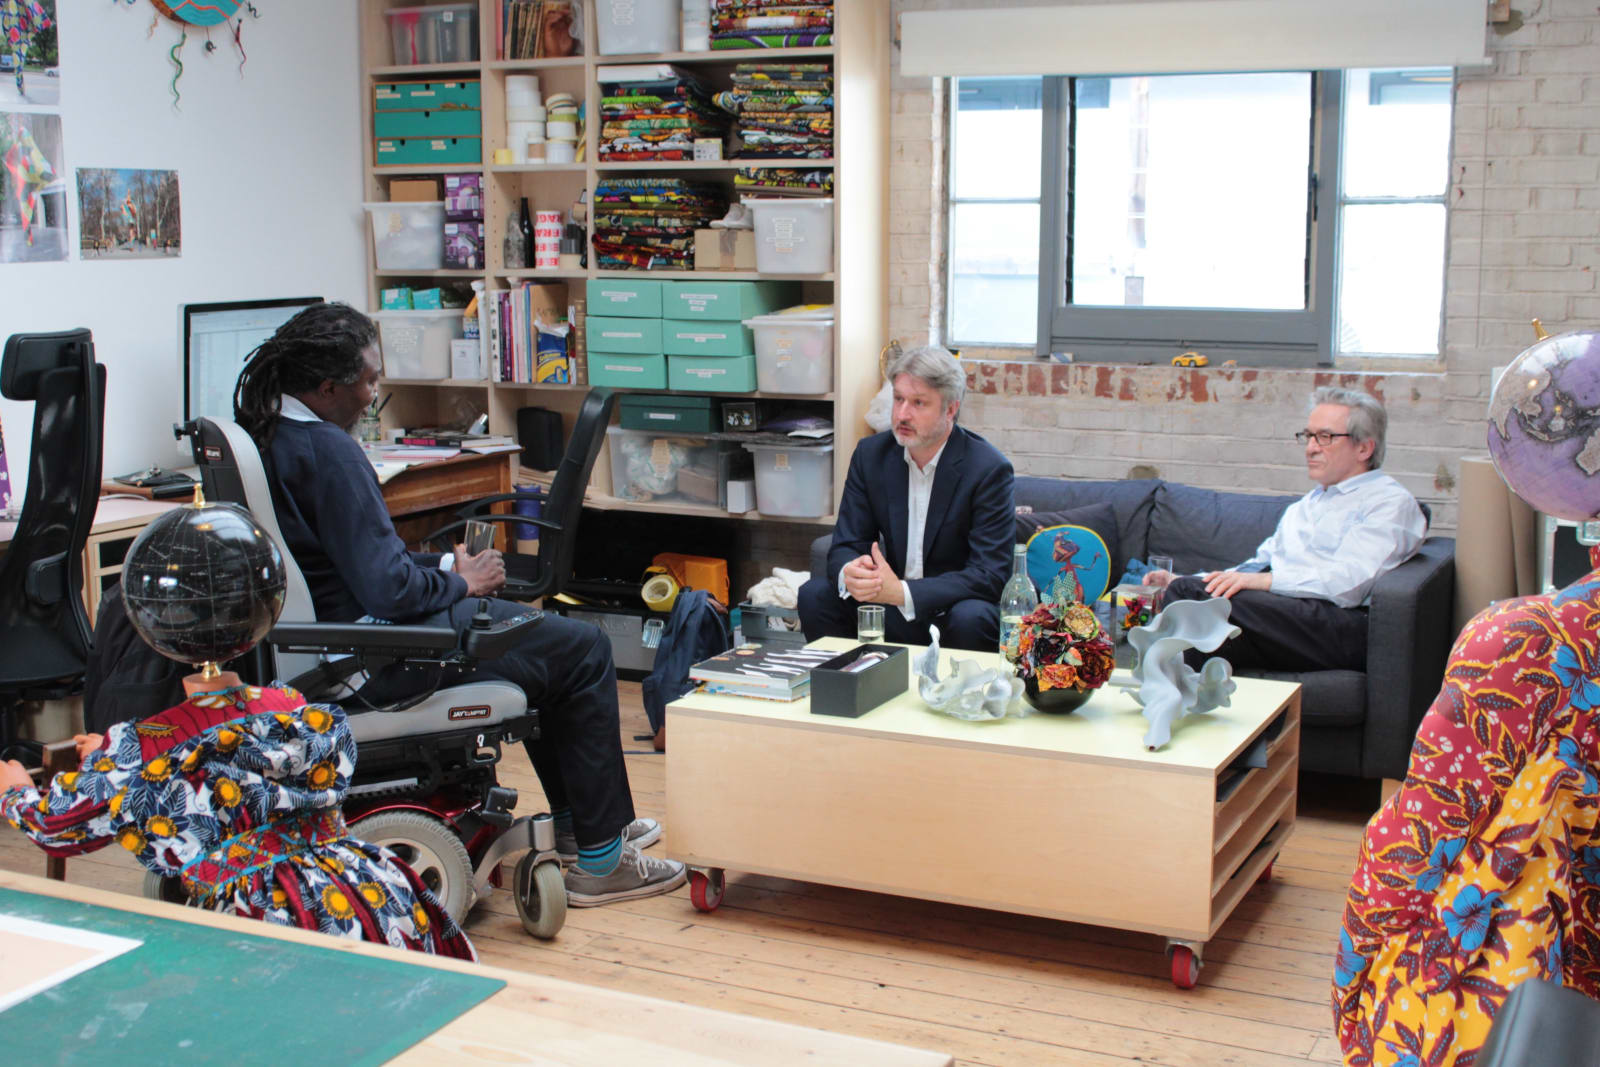 <p>Yinka Shonibare CBE, David Cleaton-Roberts and Alan Cristea at Shonibare's studio, 2019. Photo:Imogen Wright</p>